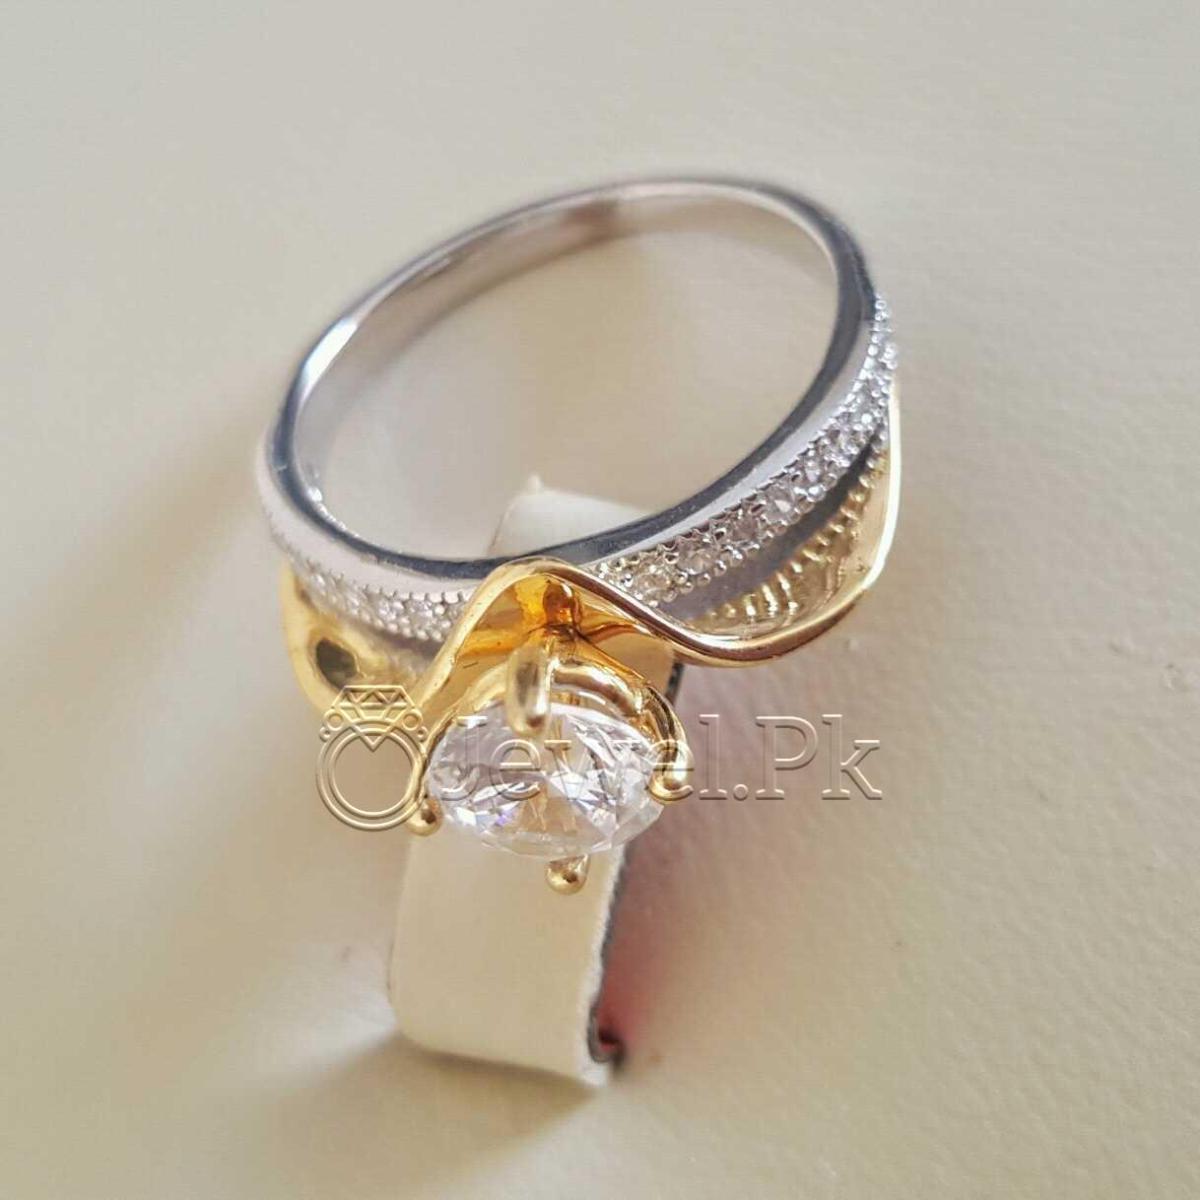 925 Silver Luxury Rings for Ladies Women Silver Rings Woman Handmade Rings 40 natural gemstones pakistan + 925 silver jewelry online